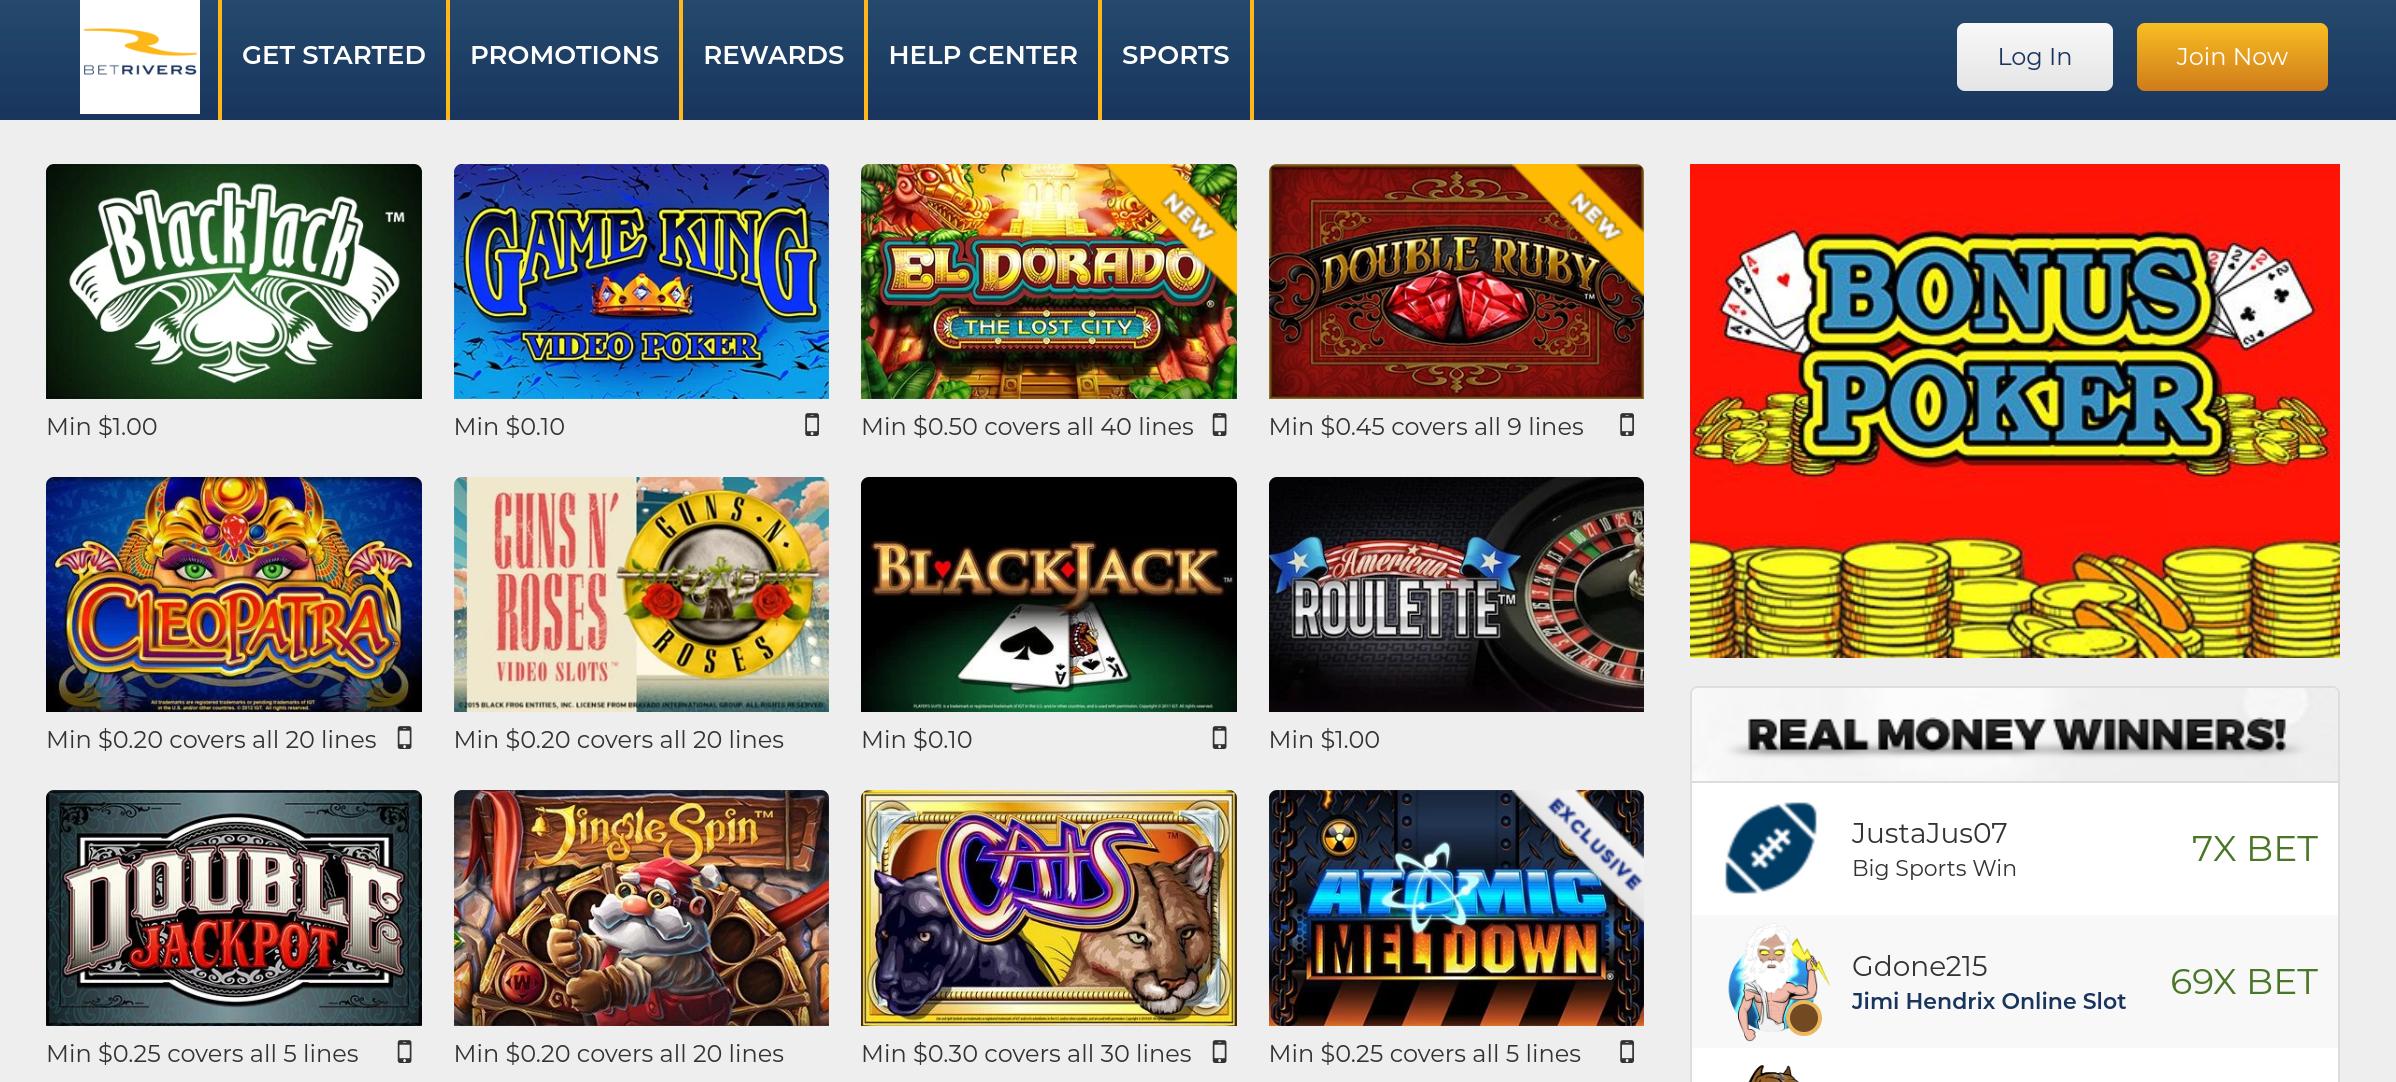 Bravado online sports betting jsk betting tips netflix